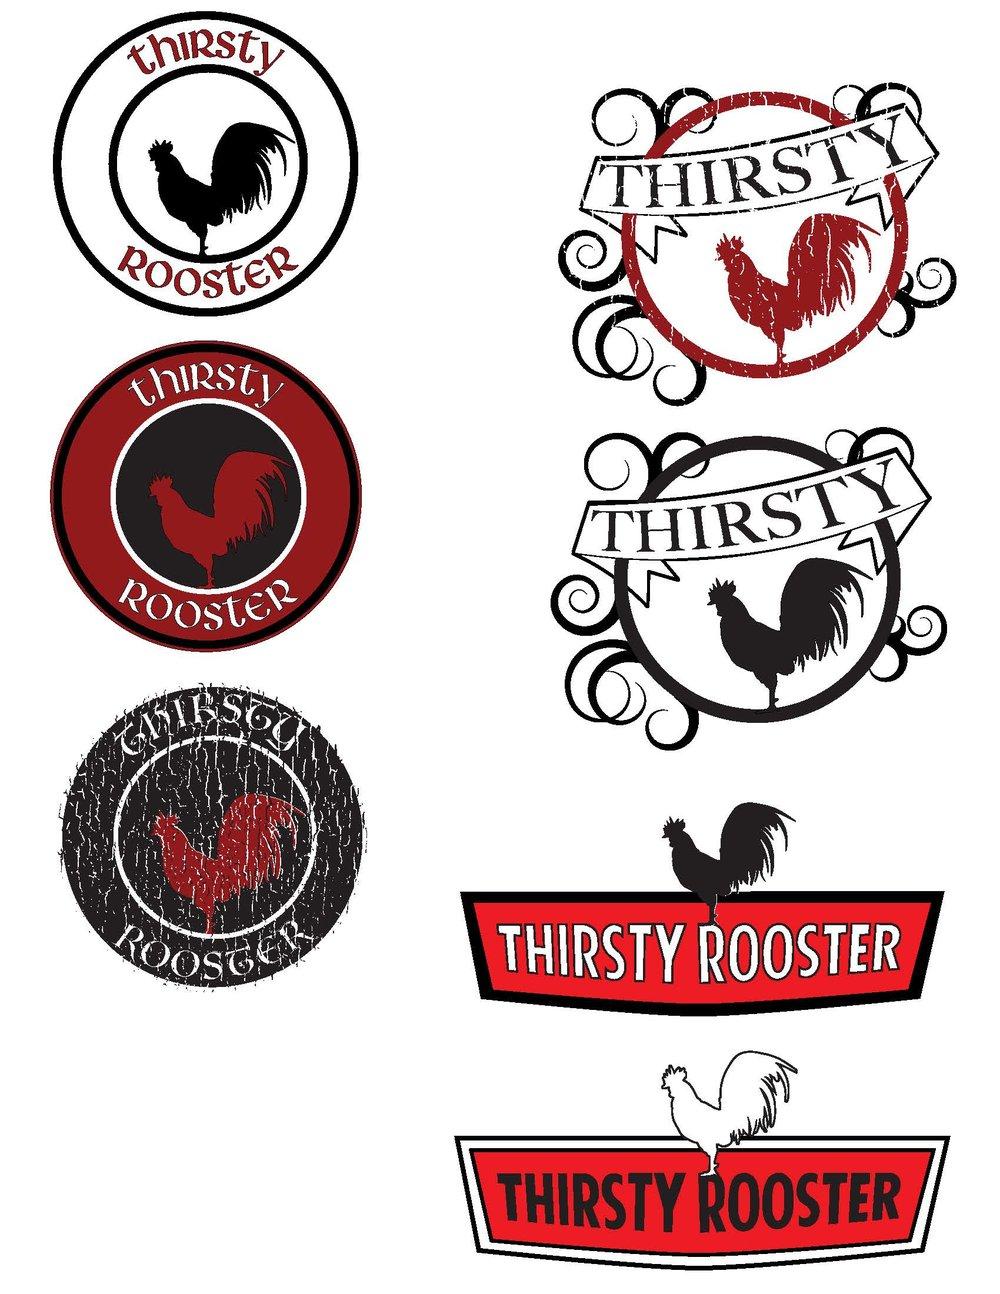 ThirstYRooster_v2.jpg